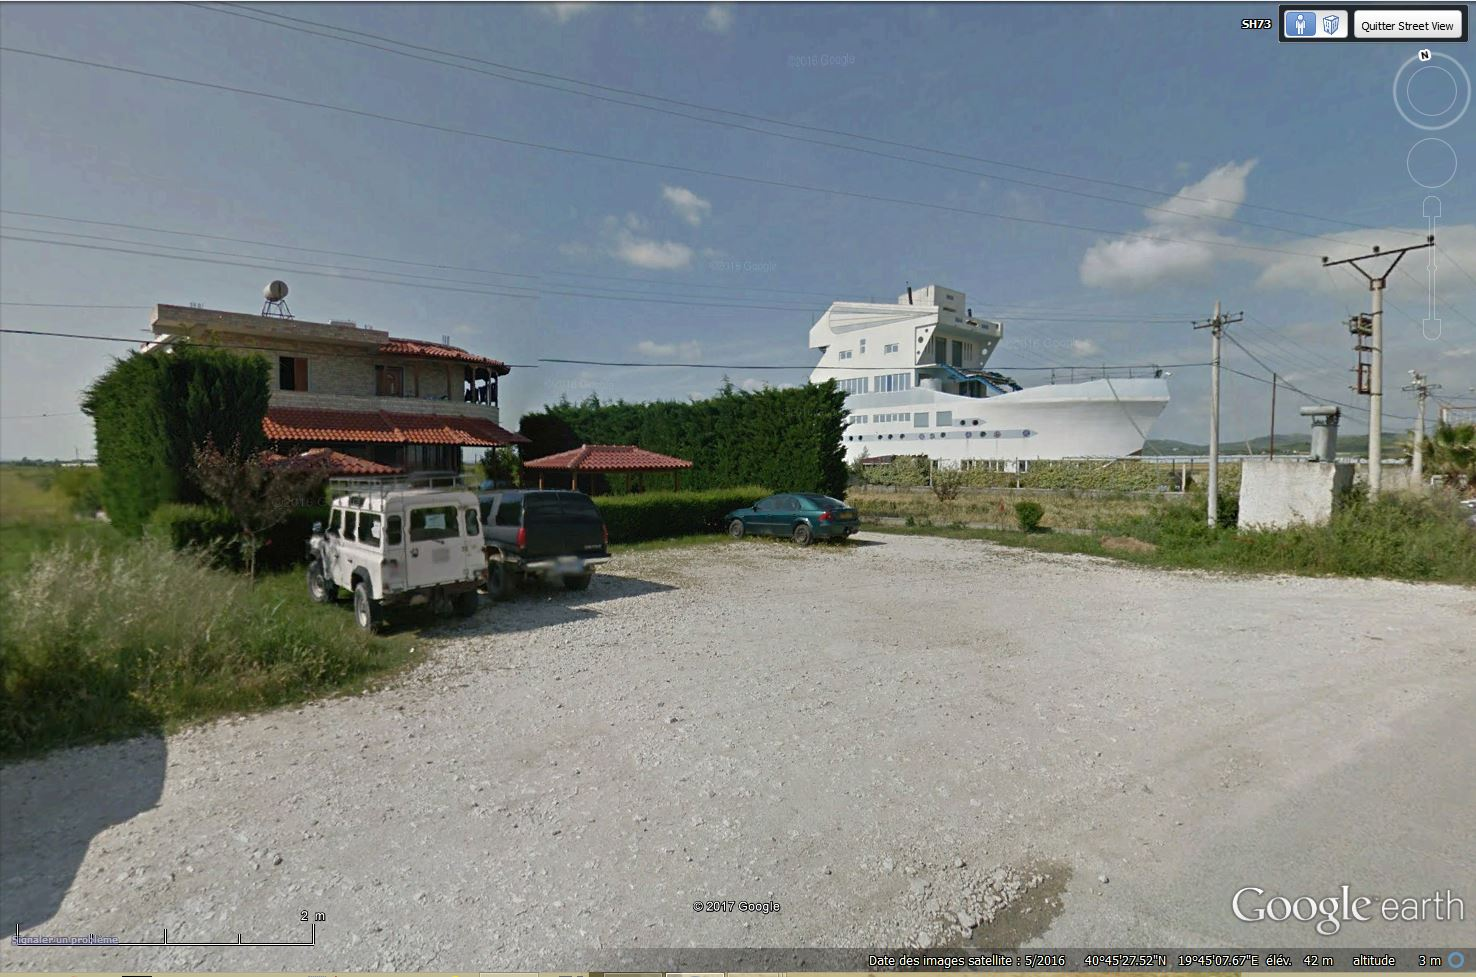 La  maison-bateau - Strumë - Albanie Tsge_254